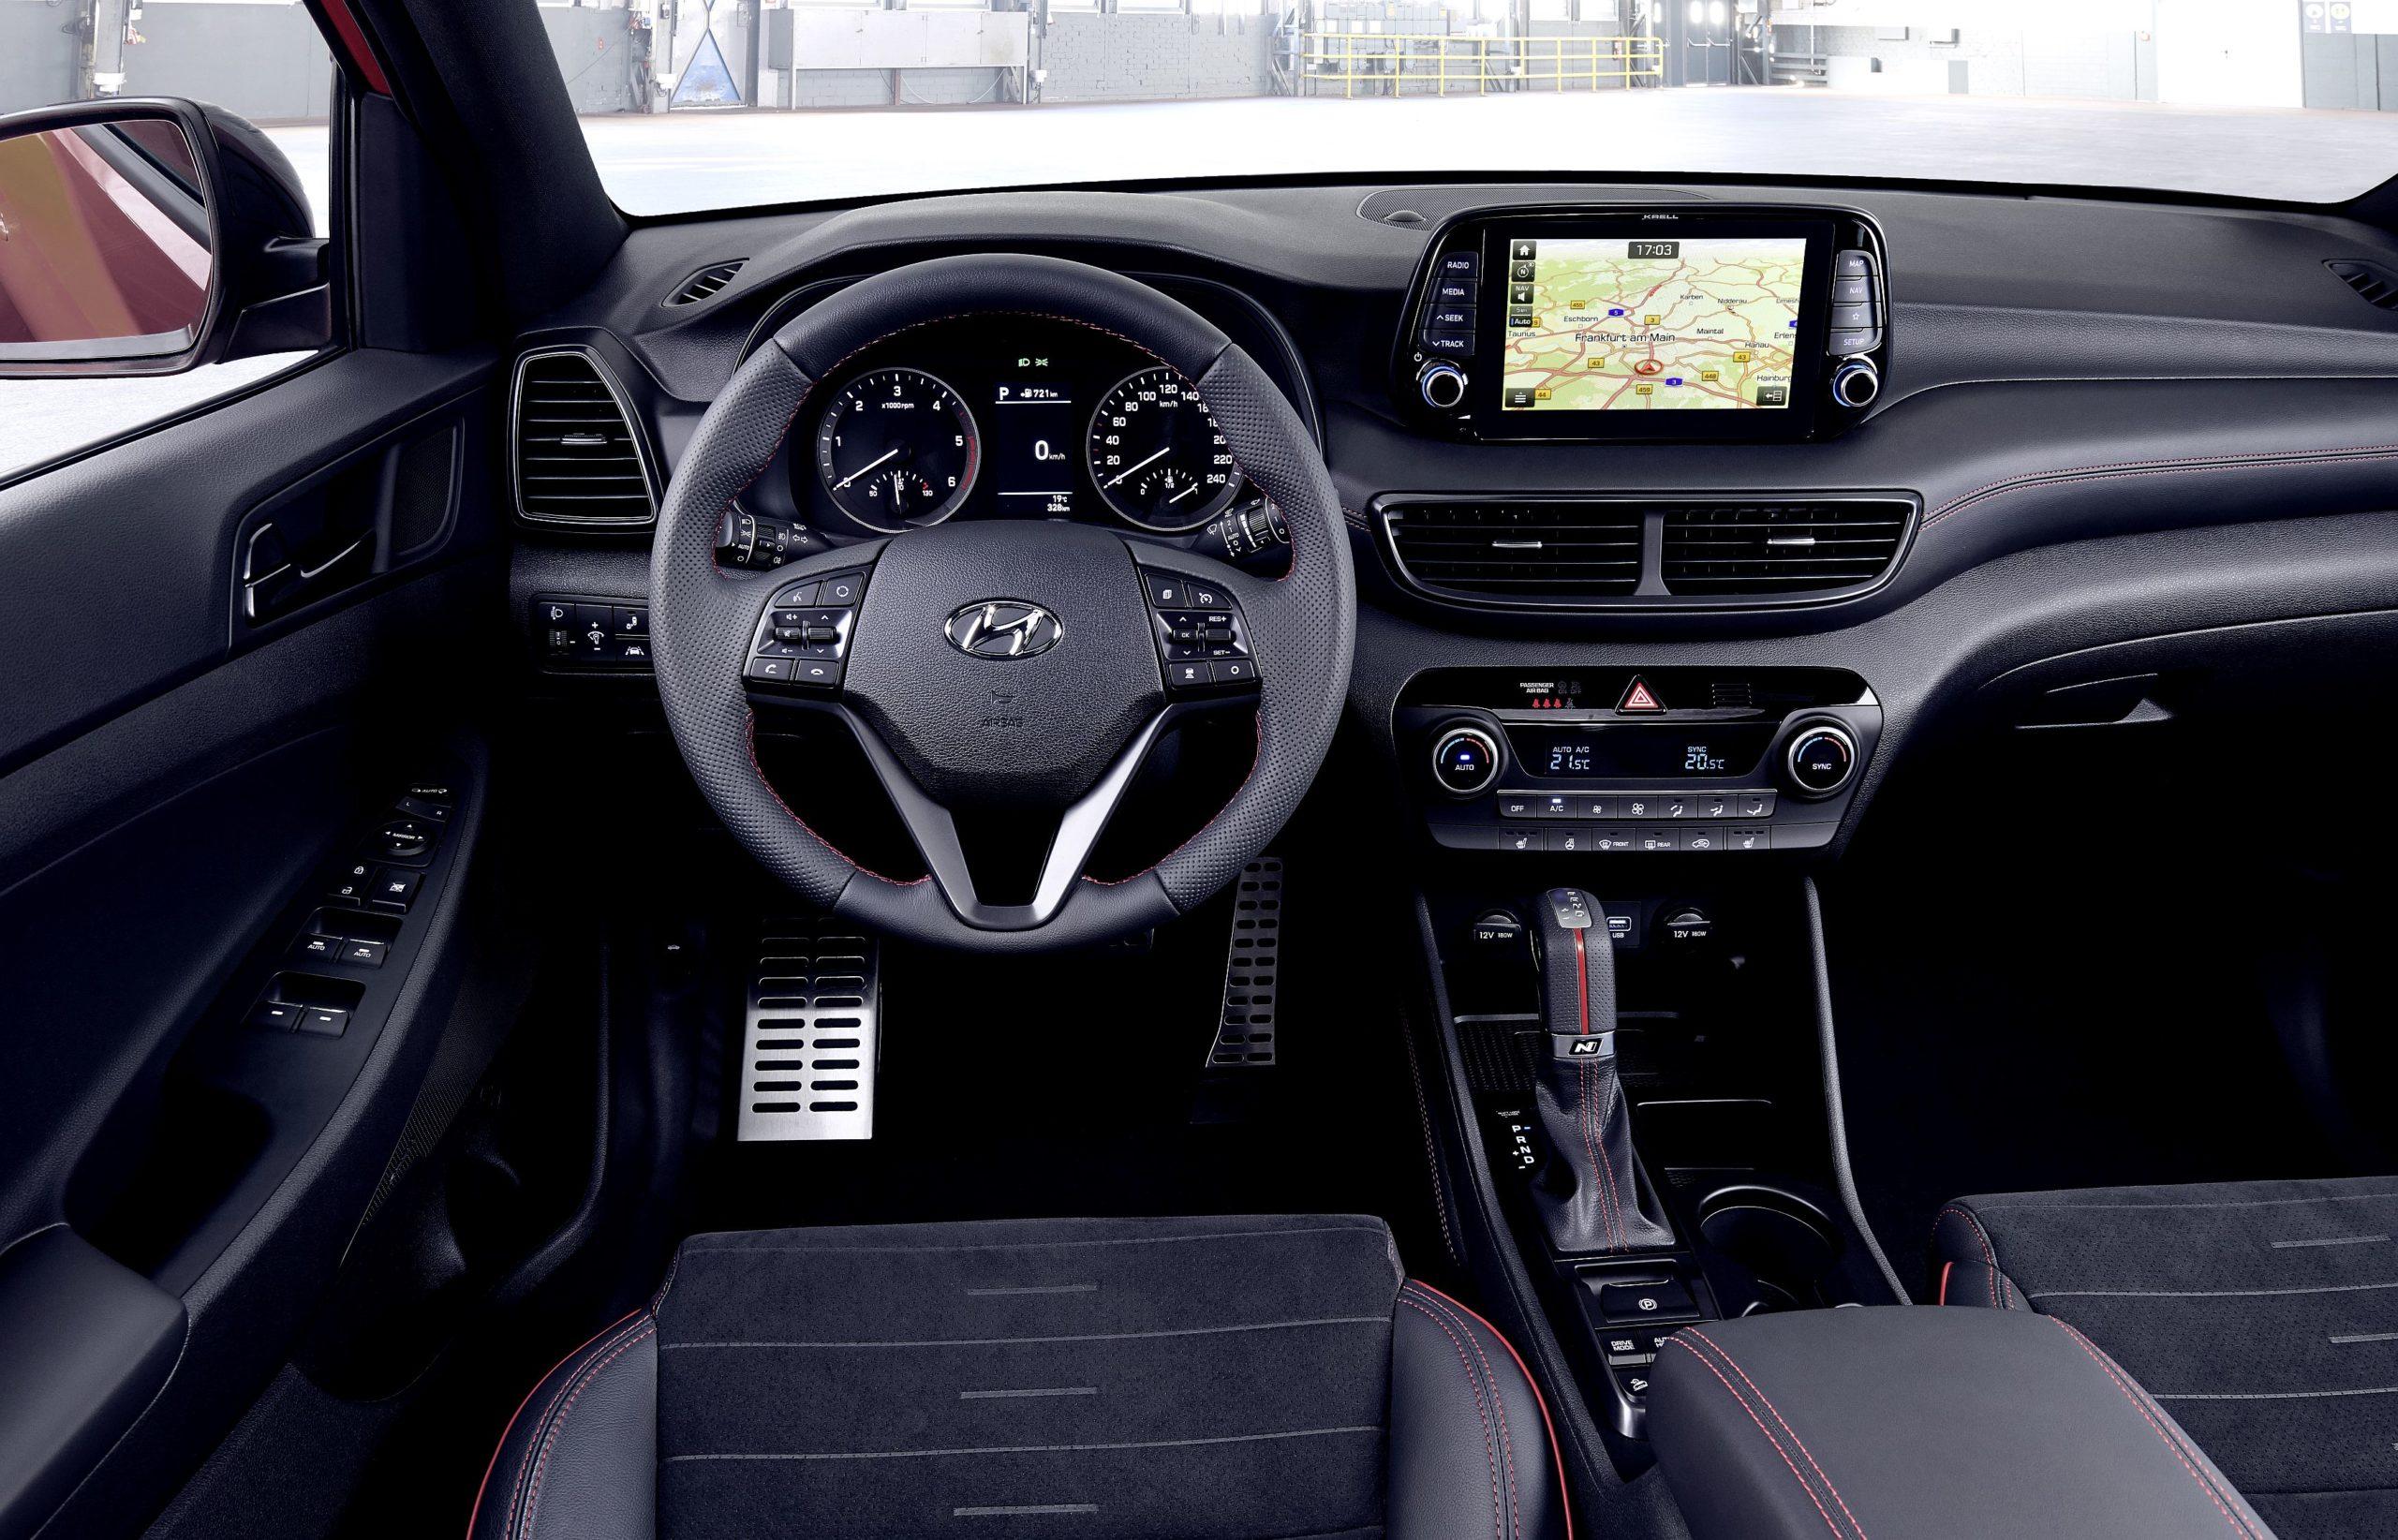 Mild-Hybrid Tucson Hyundai